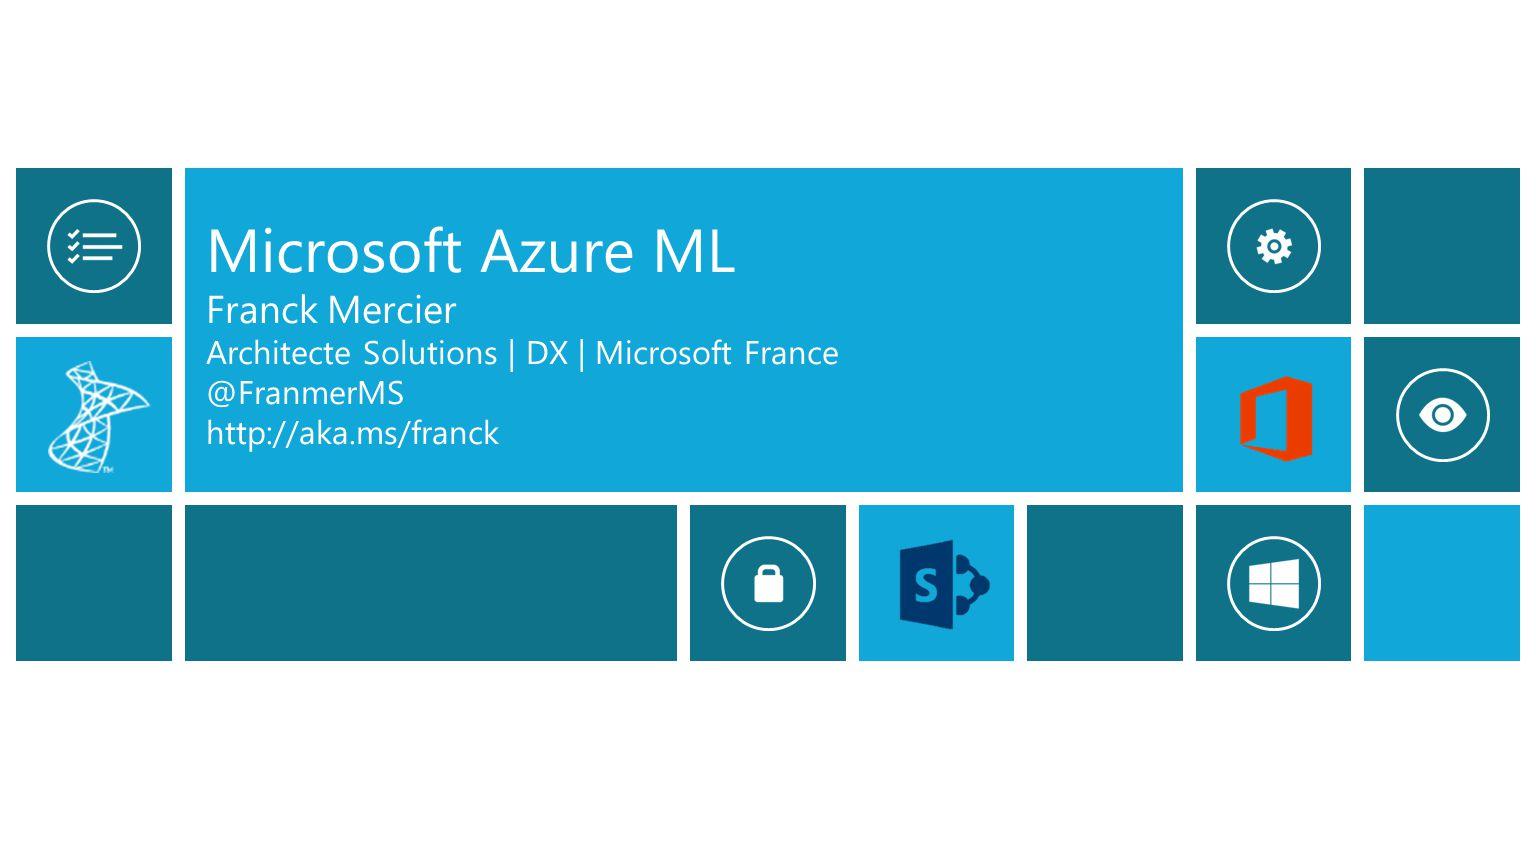 Microsoft Azure ML Franck Mercier Architecte Solutions | DX | Microsoft France @FranmerMS http://aka.ms/franck